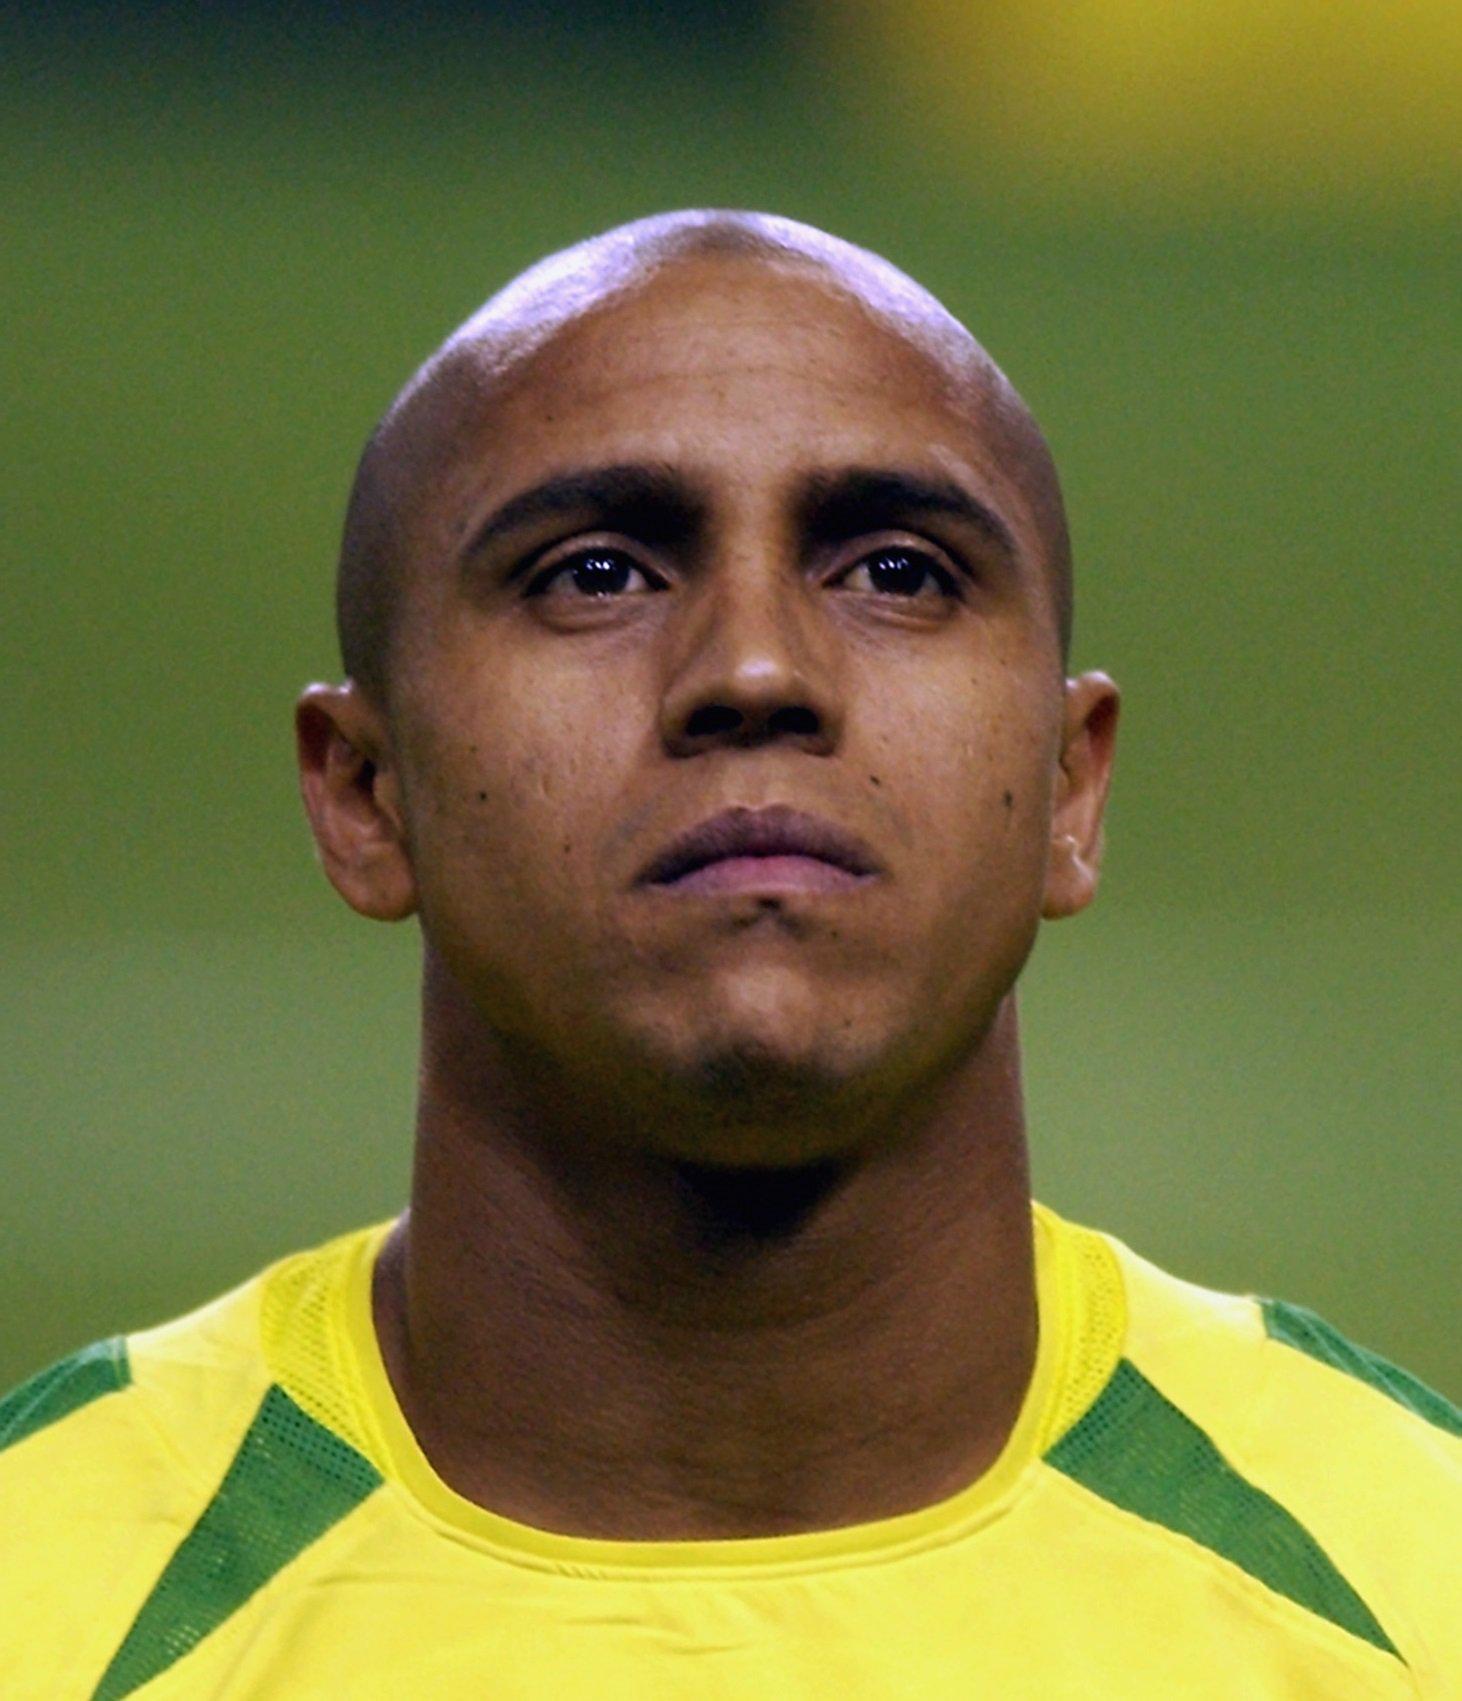 ���� All-time favourite Brazilian defender? ��  #UCL #TBT #ThrowbackThursday ⏰�� https://t.co/DwIODkPElh